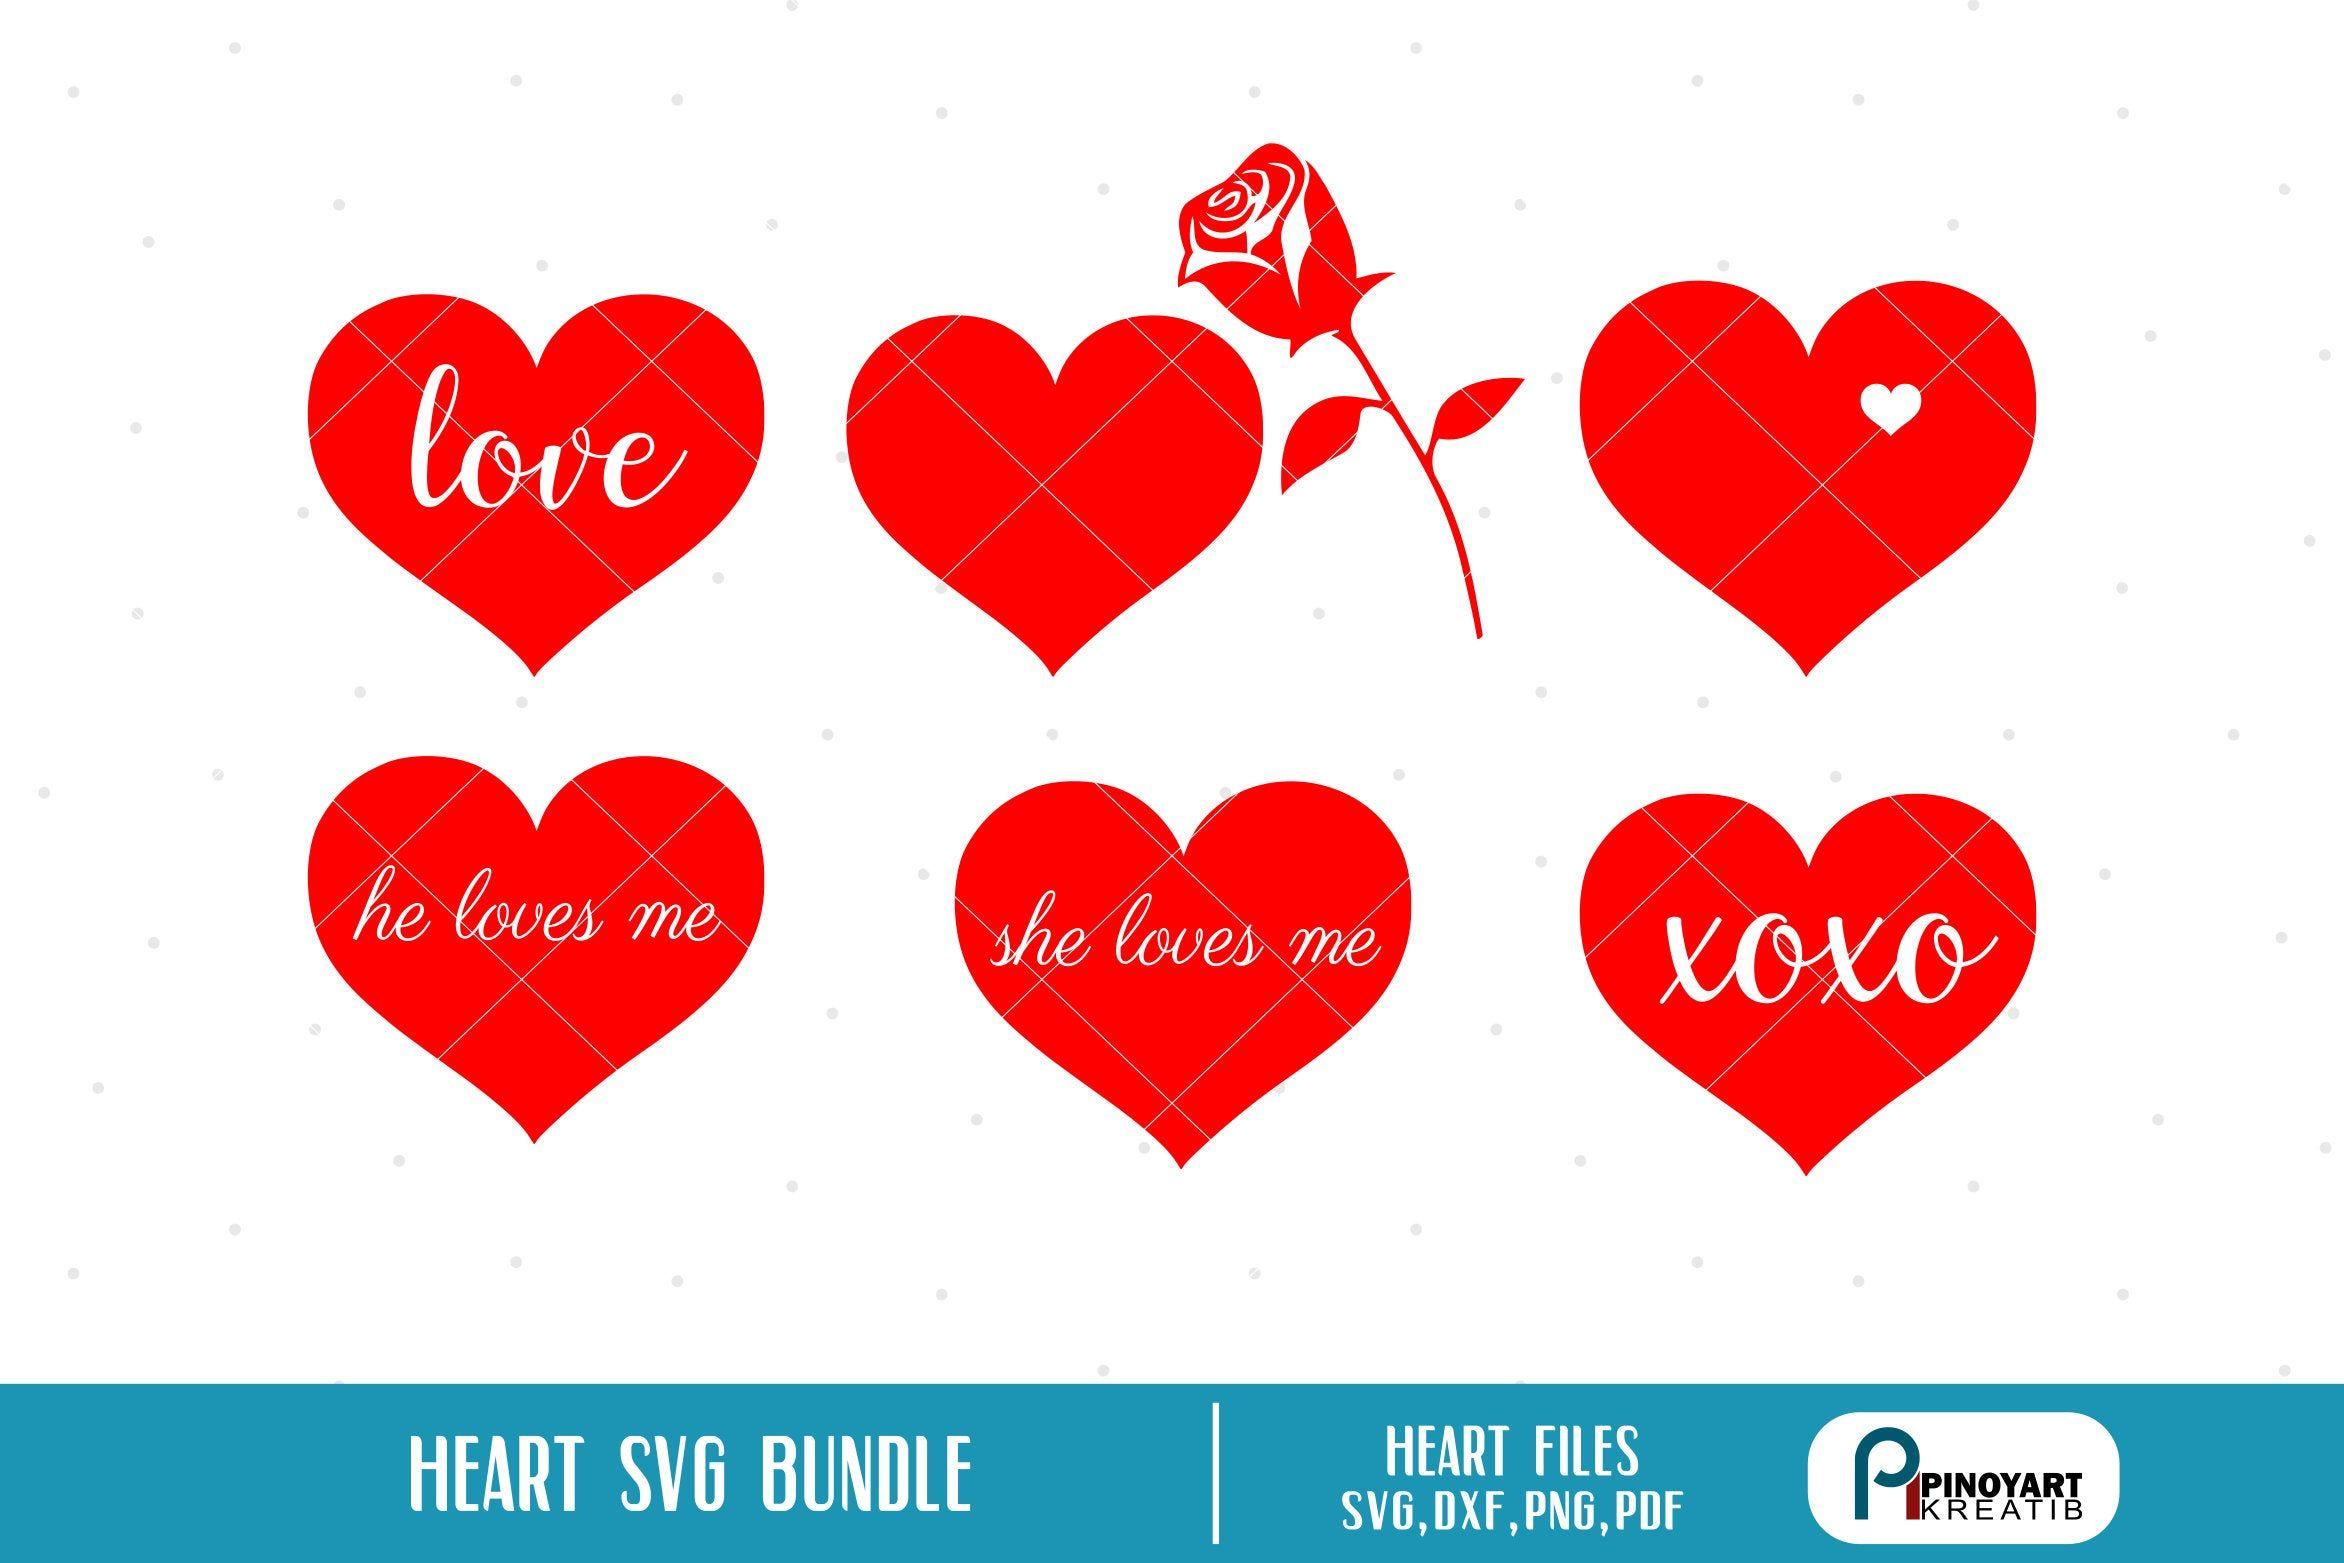 Love Svg File Heart Svg File Xoxo Svg File Valentines Svg Valentine S Day Svg Rose Svg File Heart Graph Valentine Svg Files Valentines Svg Heart Graphics